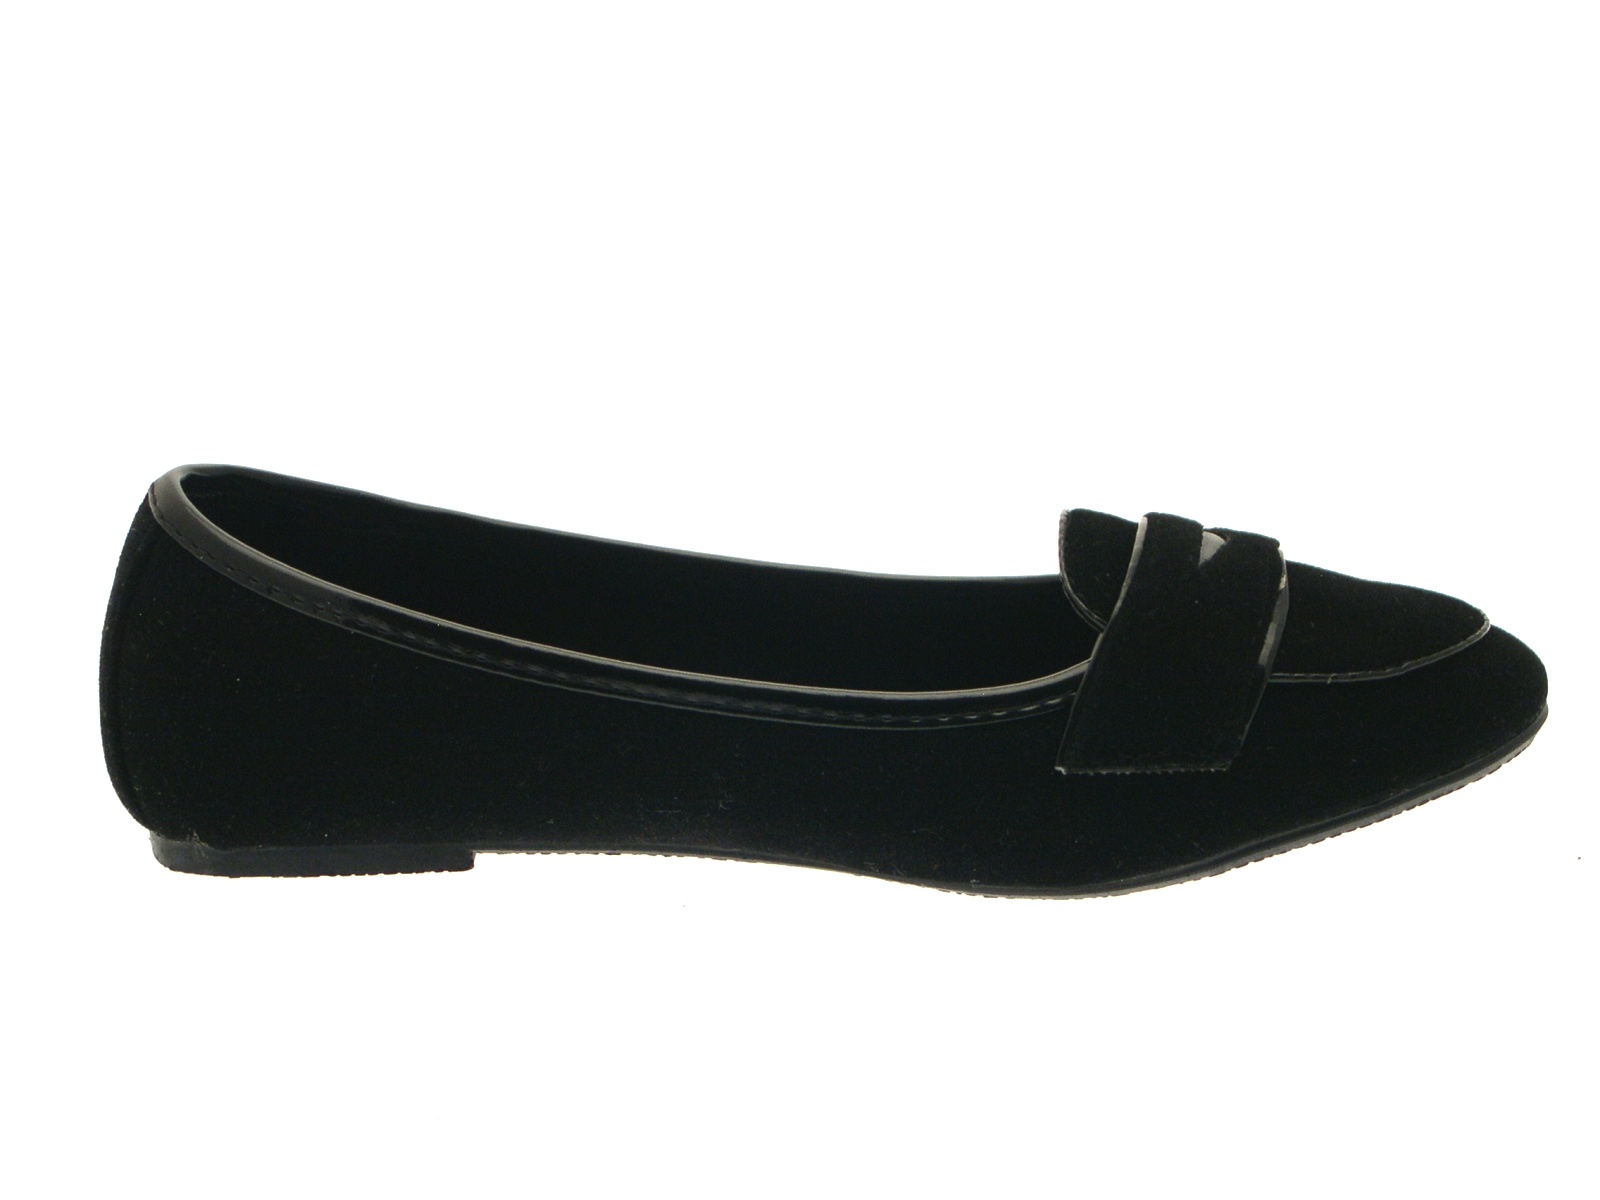 Girls Kids Black Slip On Plain Faux Suede Loafer School Shoes Junior Size Uk 9-2   EBay